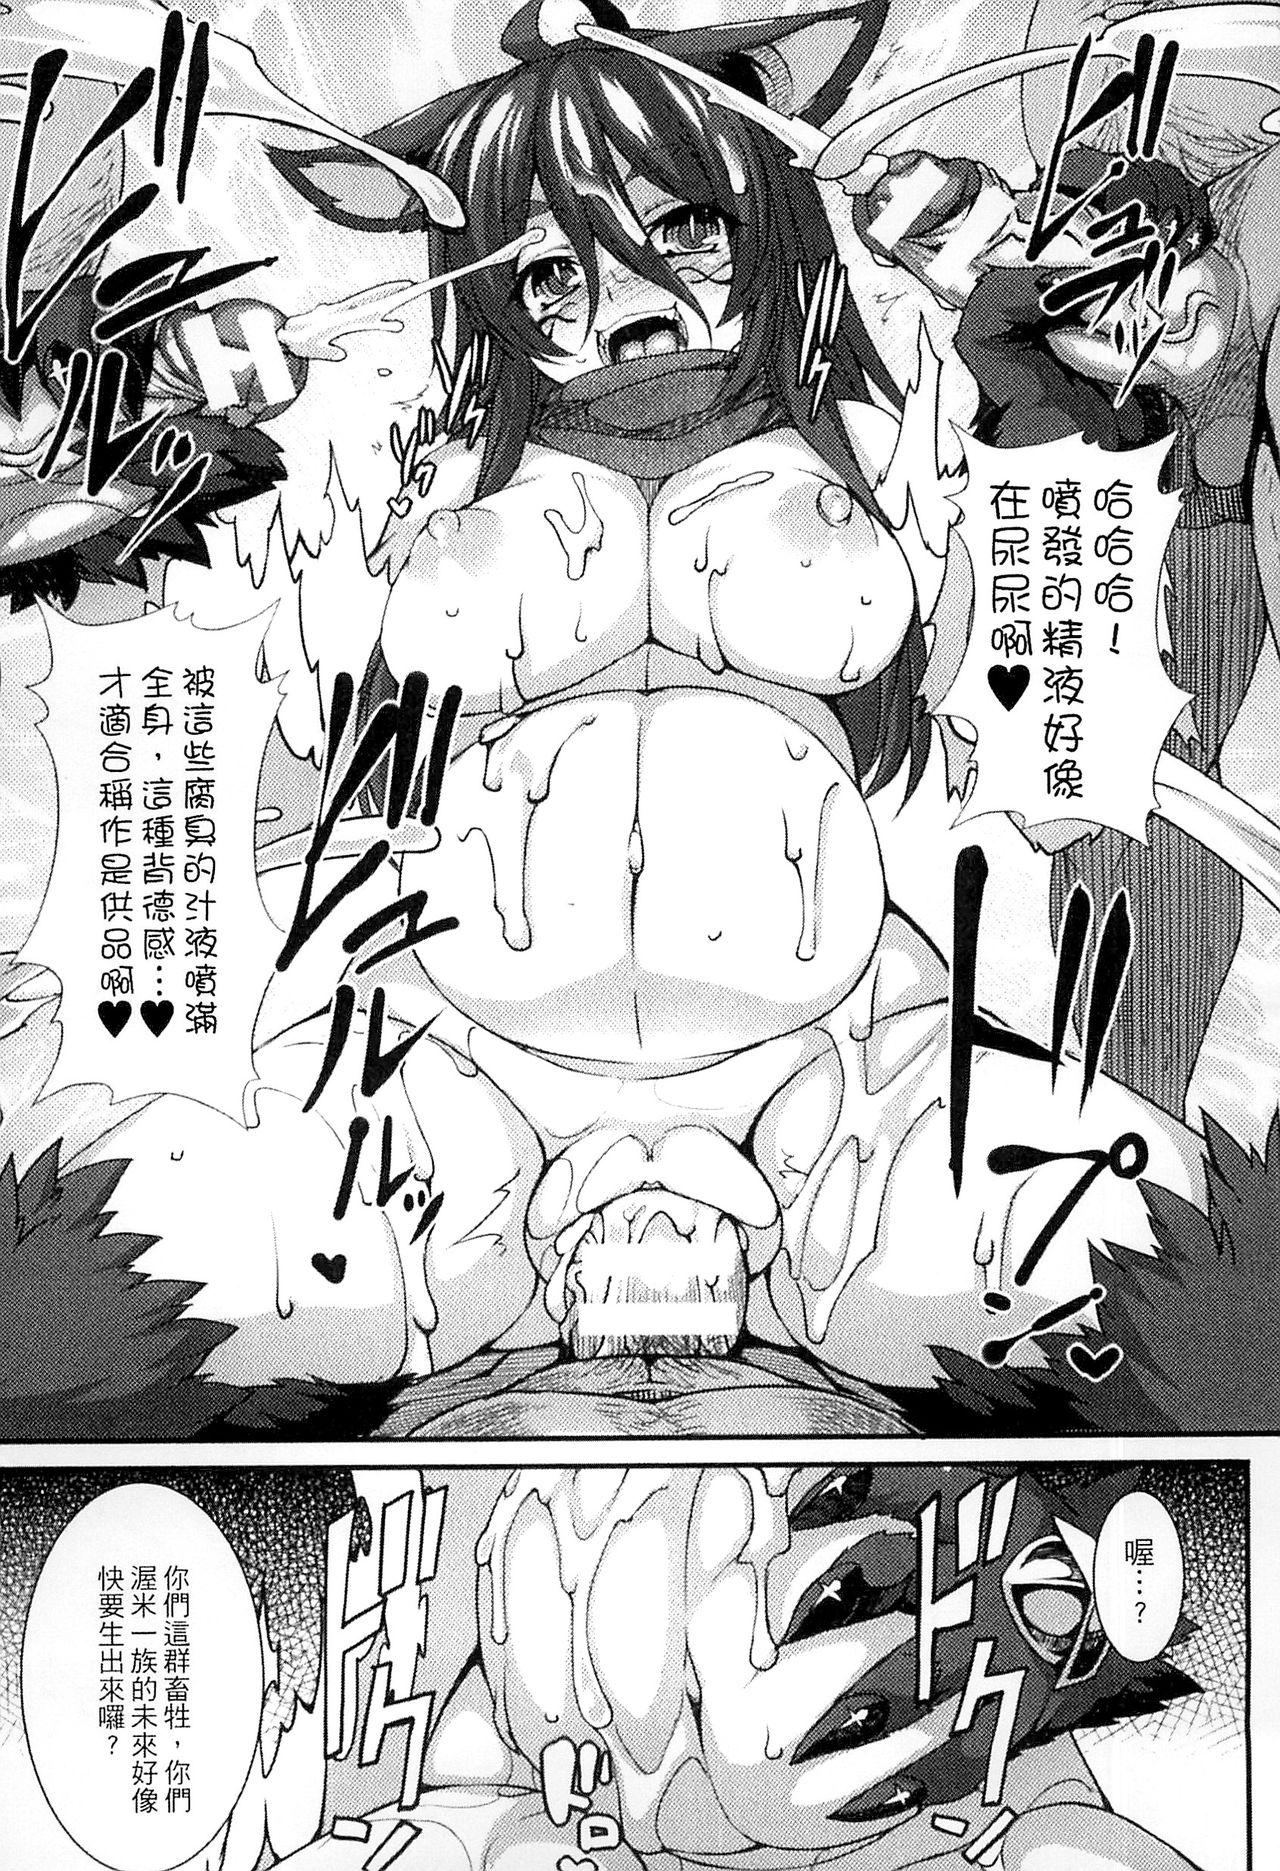 [Takayuki Hiyori] Aiyoku Gensou no Kai ~Cthulhu Pregnant~   愛欲幻想之怪 -克蘇魯- [Chinese] 57